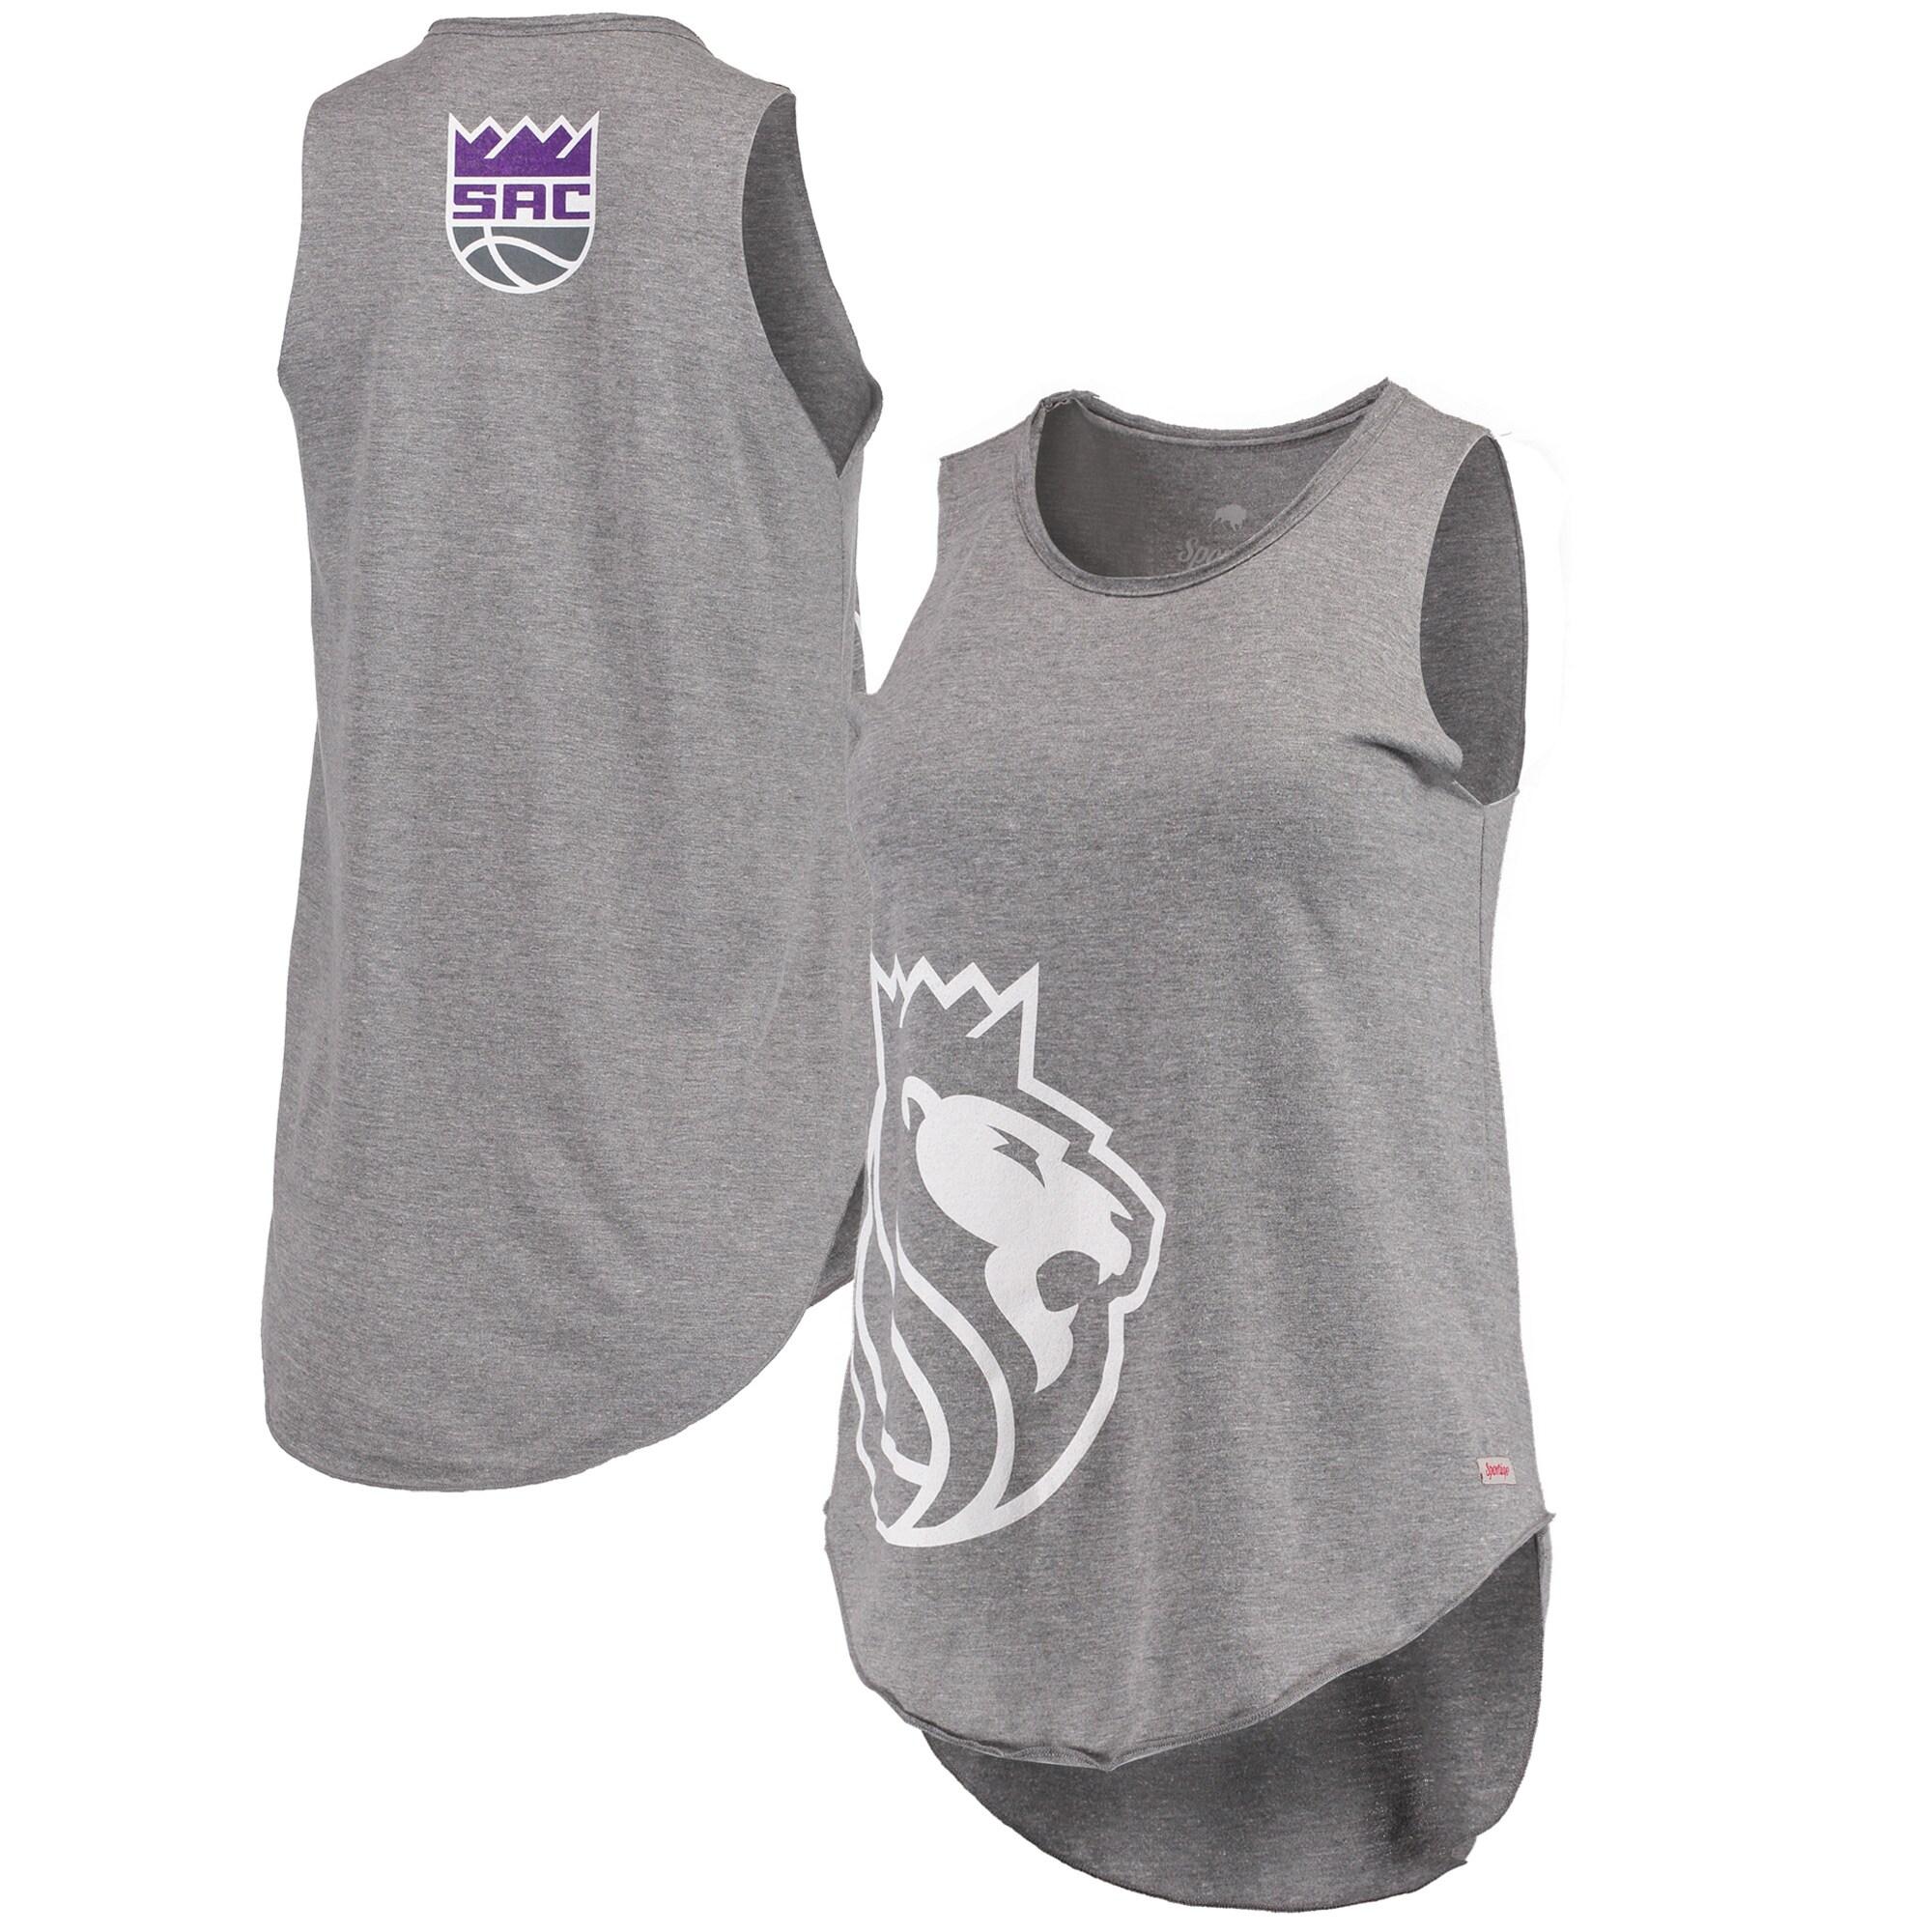 Sacramento Kings Women's Janie Wordmark Scoop Neck Tri-Blend Tank Top - Gray